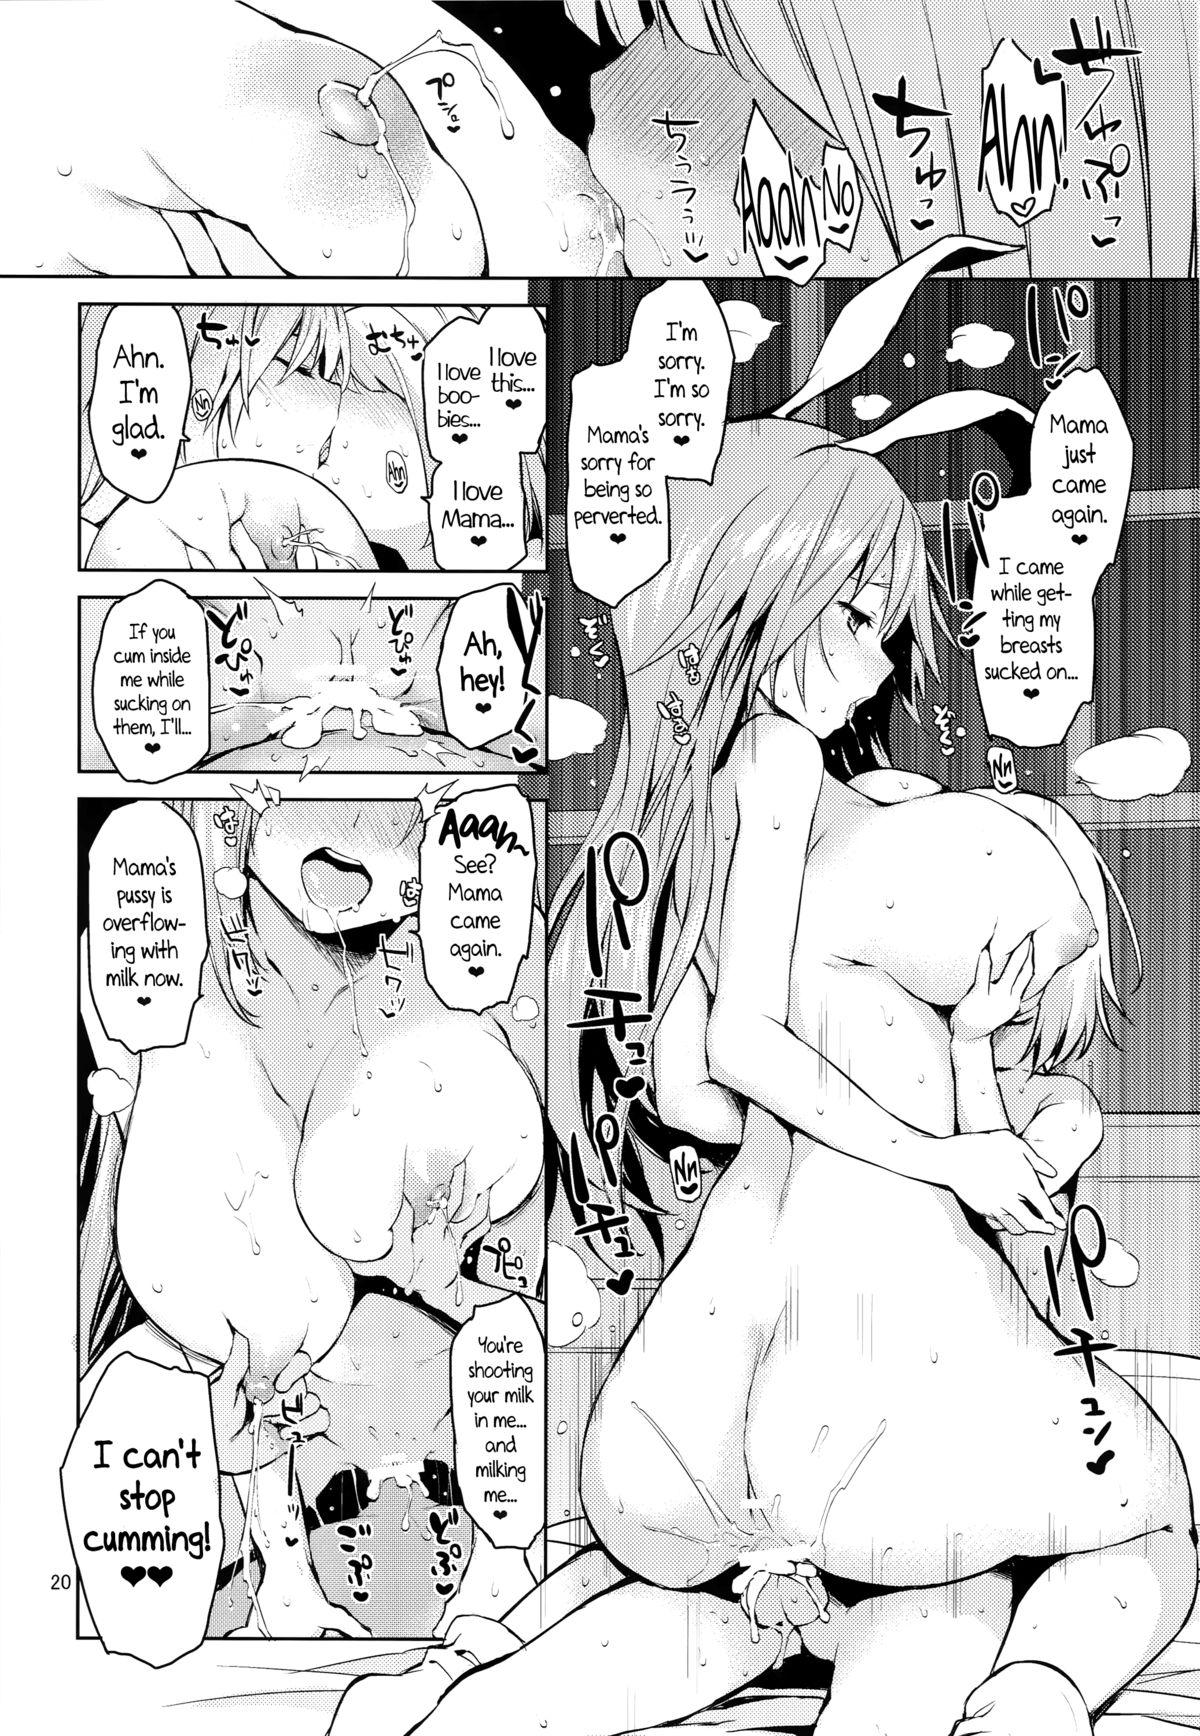 (C89) [Anmitsuyomogitei (Michiking)] Suwasete Kudasai Udonge-mama! | Let Me Suck On Them, Udonge-Mama! (Touhou Project) [English] [PSYN + Facedesk] 18